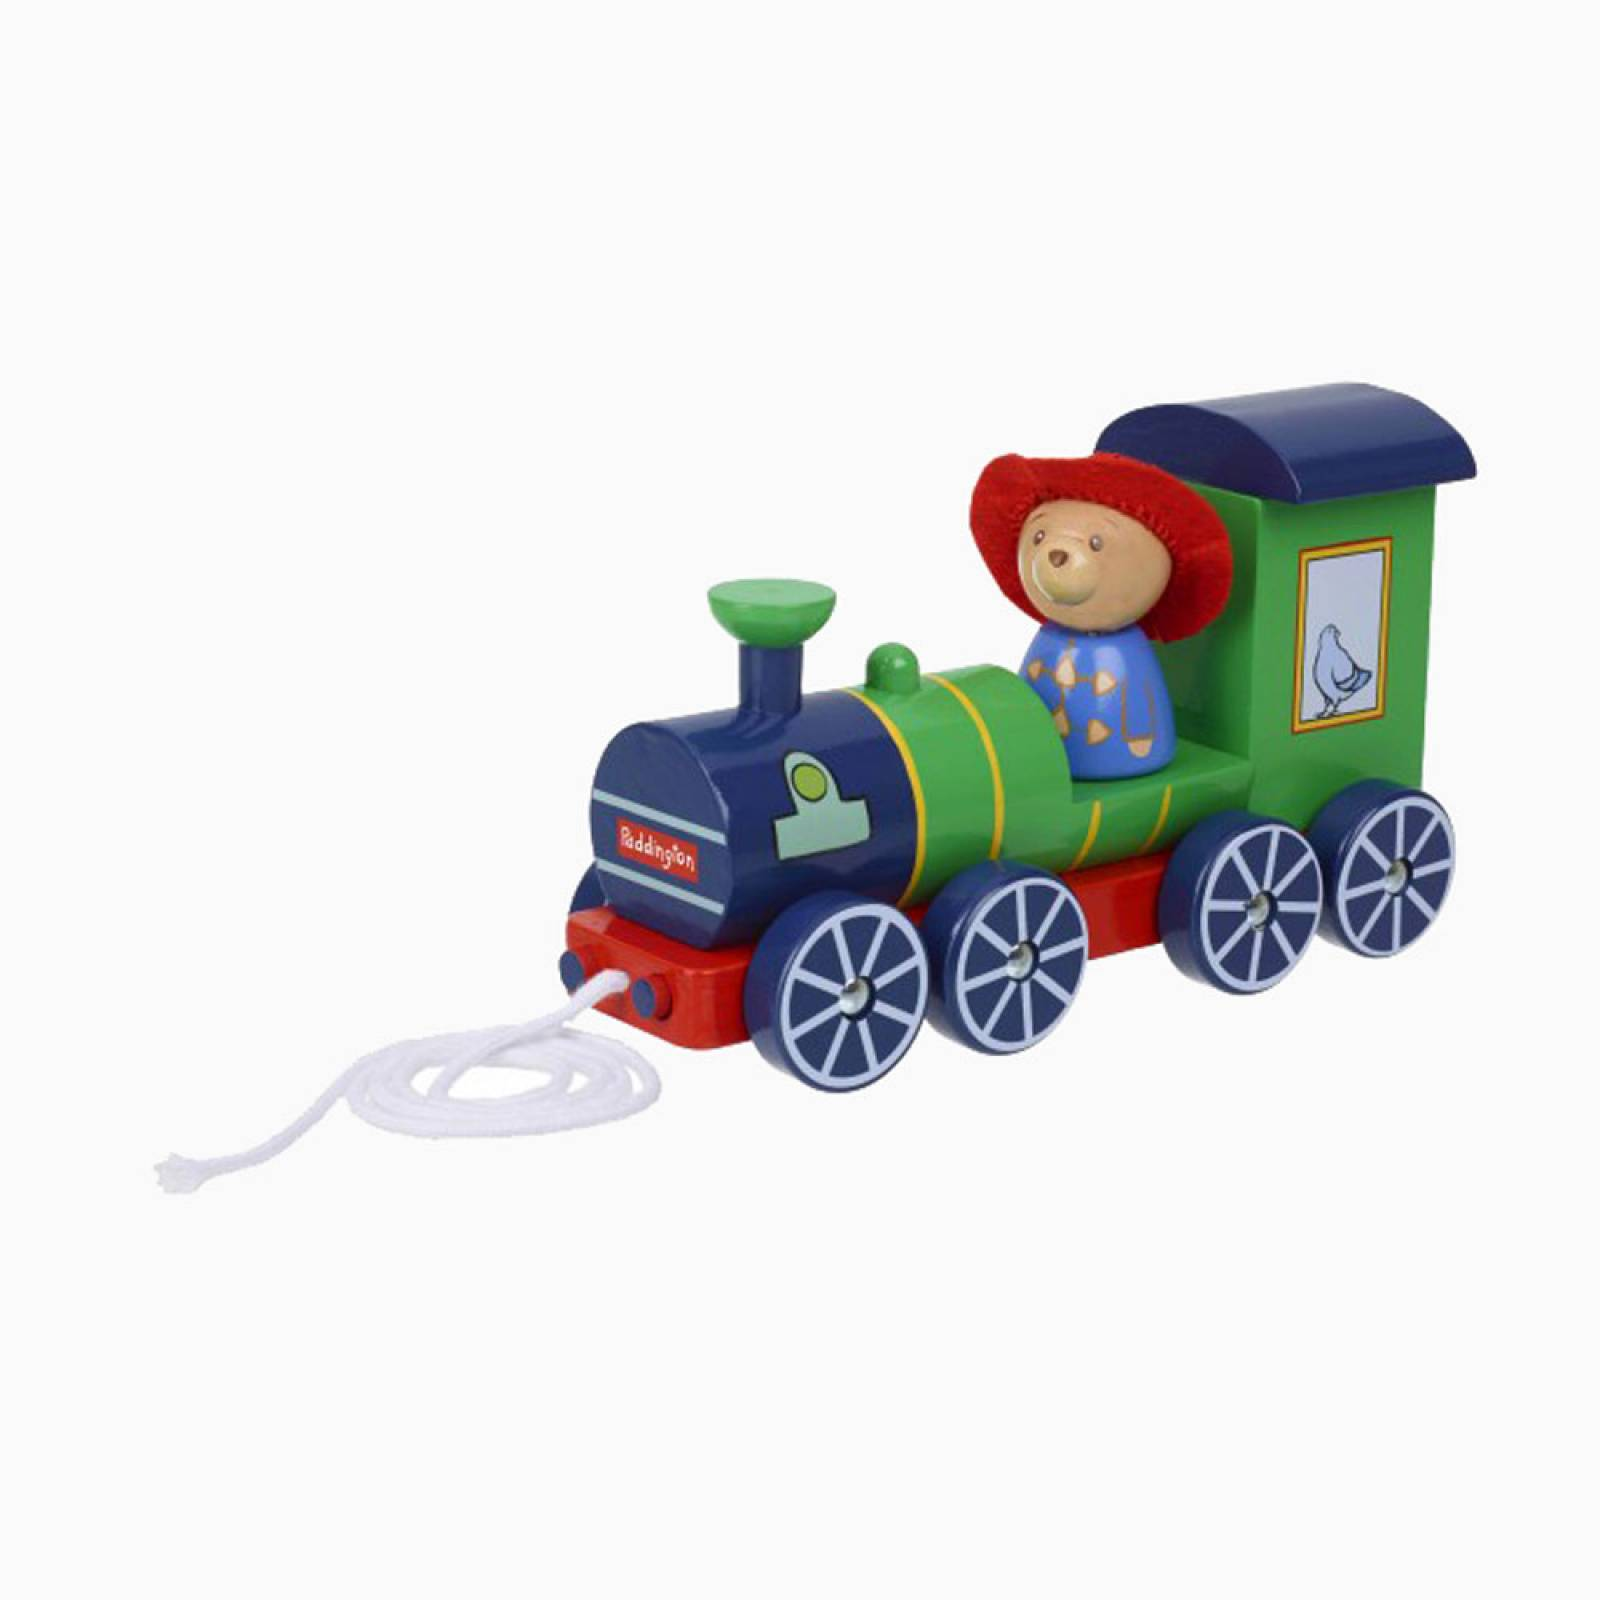 Paddington Pull Along Steam Train By Orange Tree Toys 1+